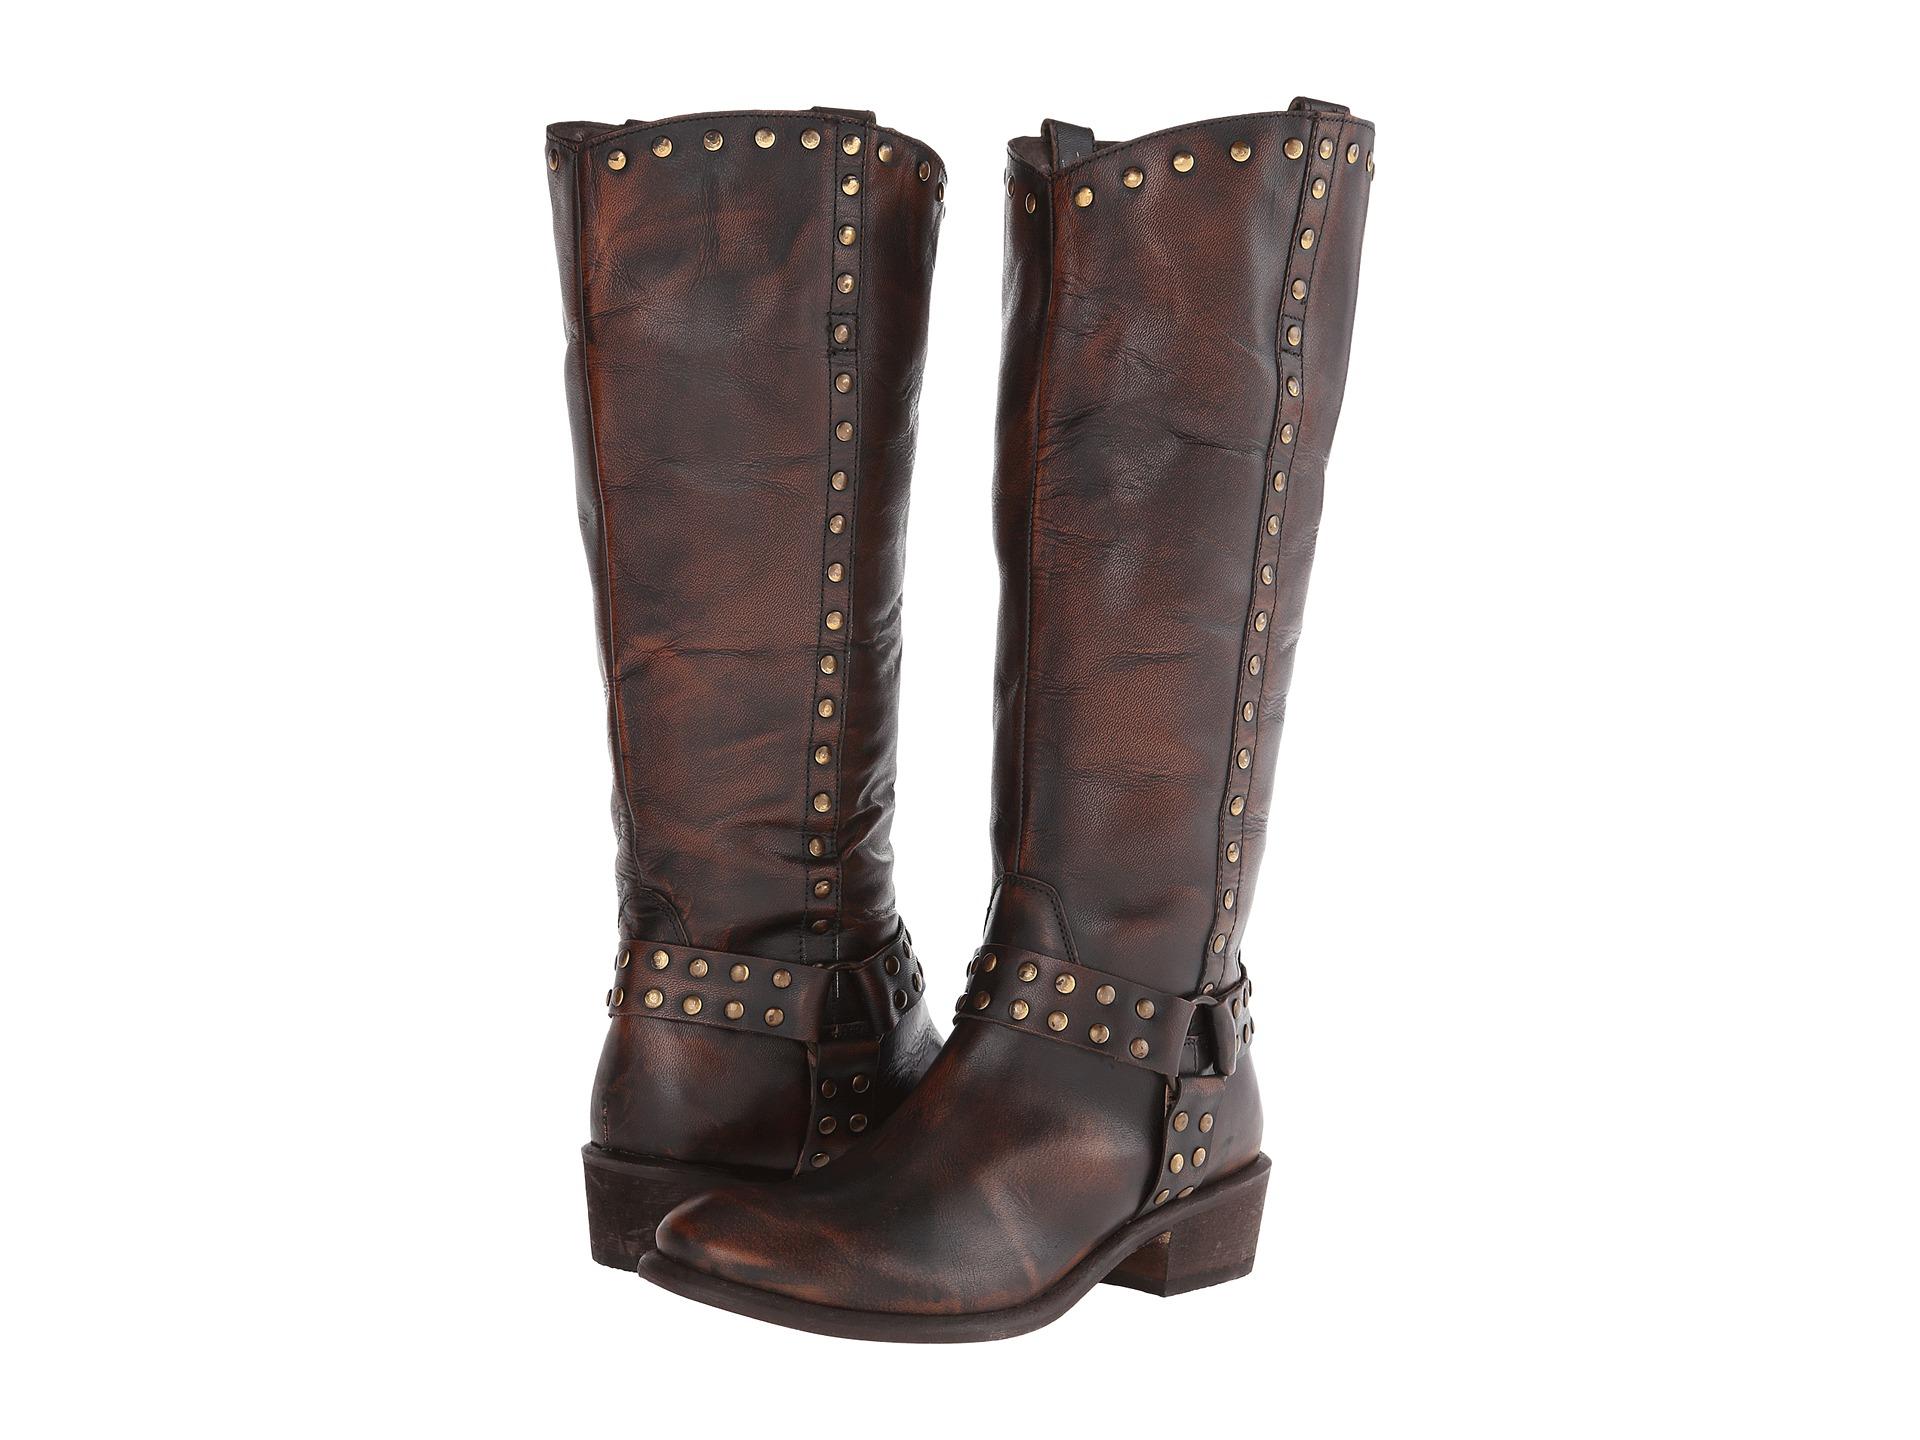 boots Boots Women at 6pm.com